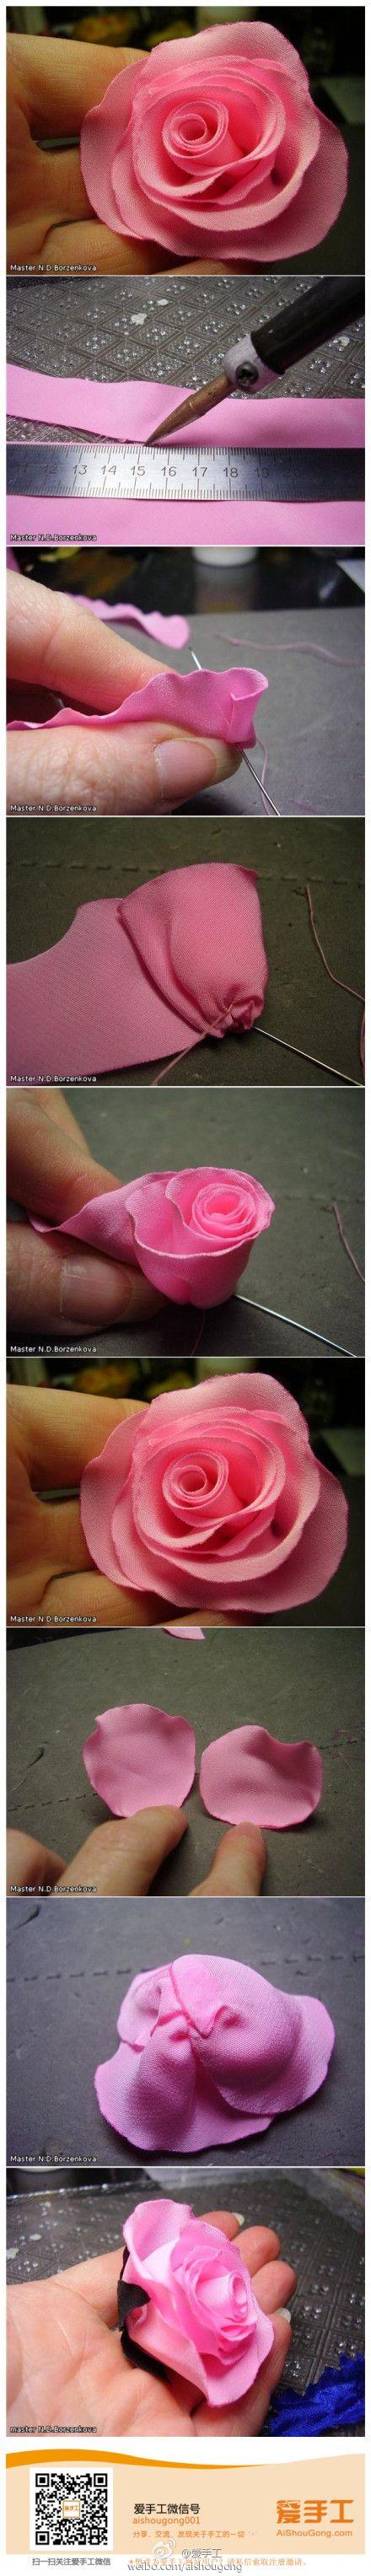 Handmade fabric rose.